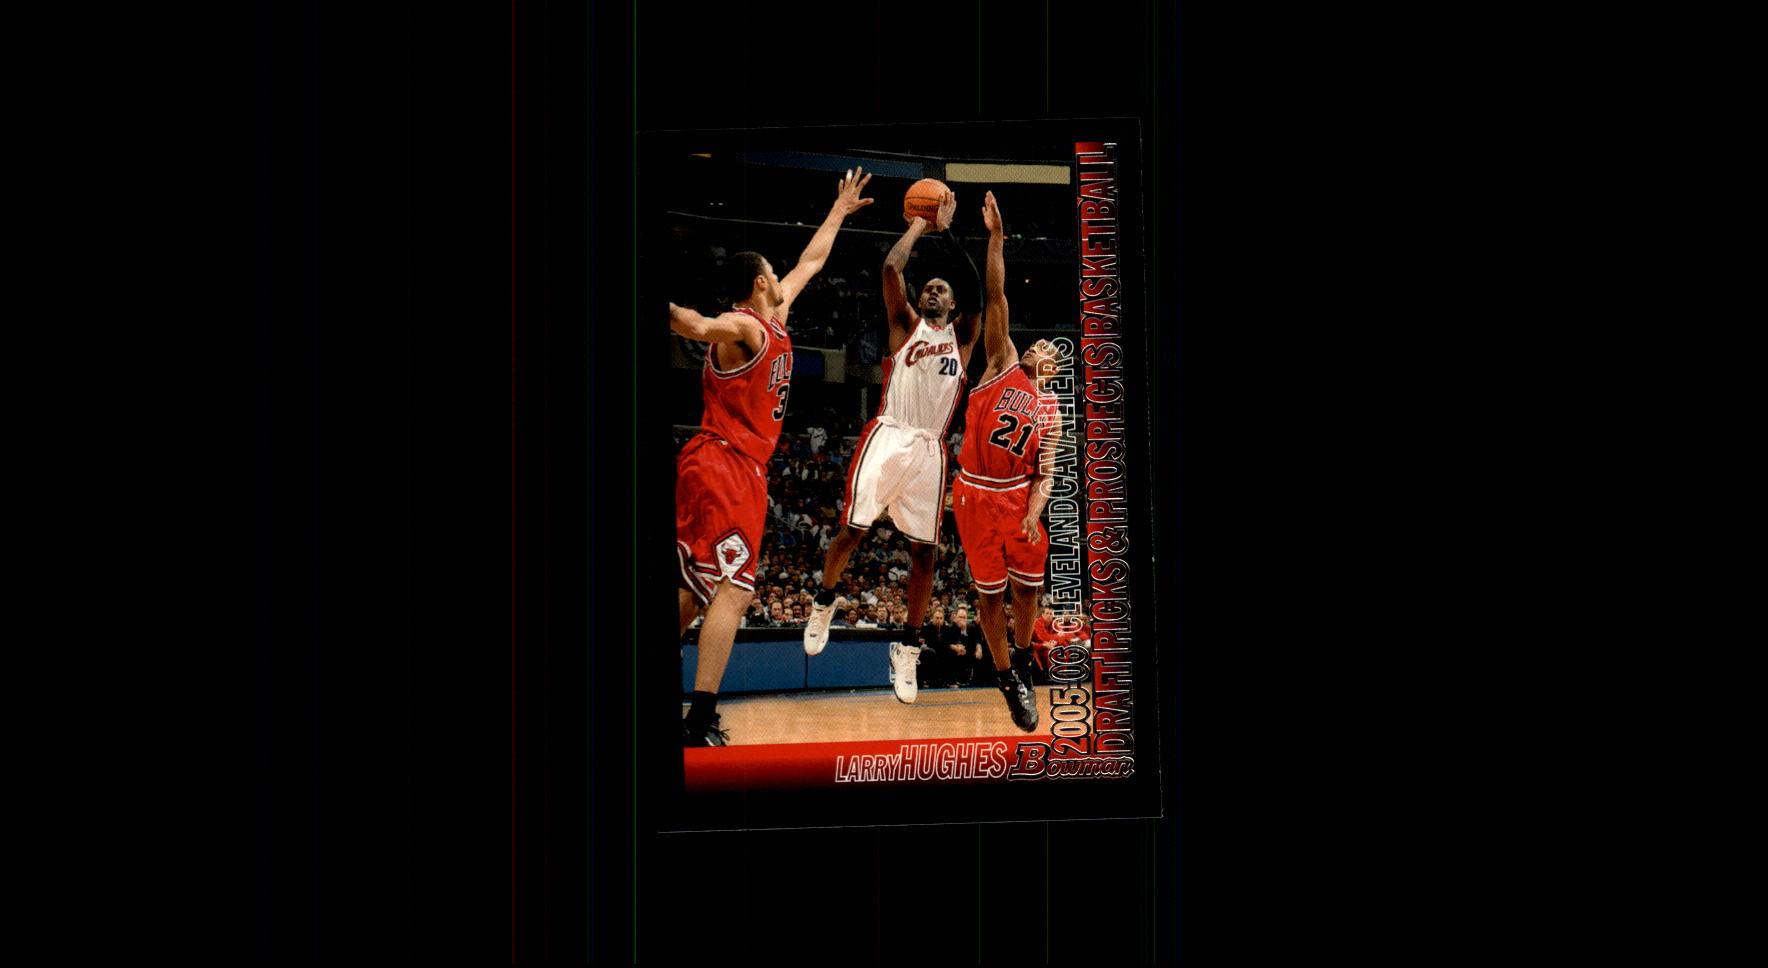 2005-06 Bowman #33 Larry Hughes